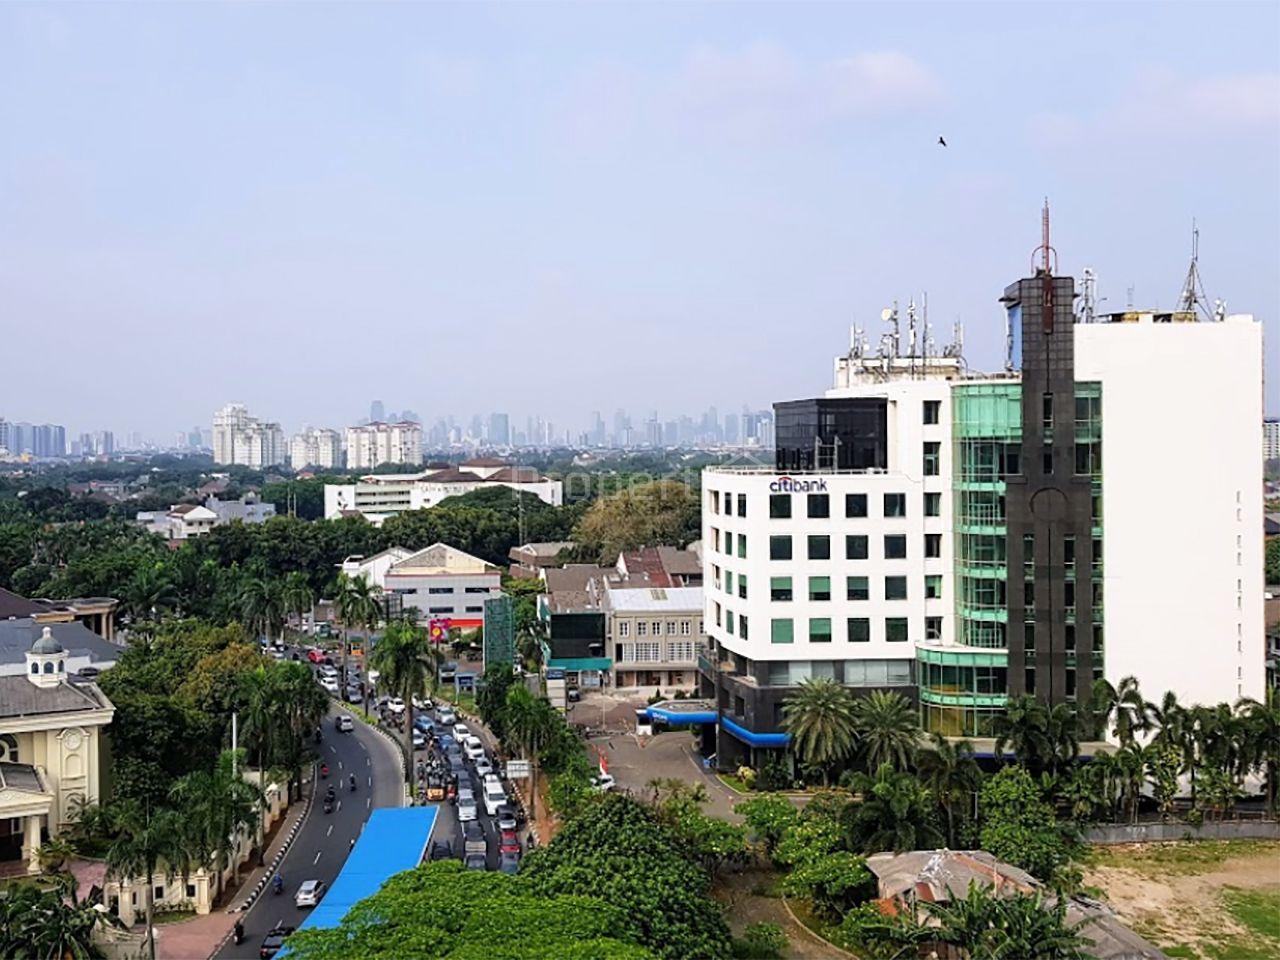 Commercial Land Front of Pondok Indah Busway Stop, DKI Jakarta